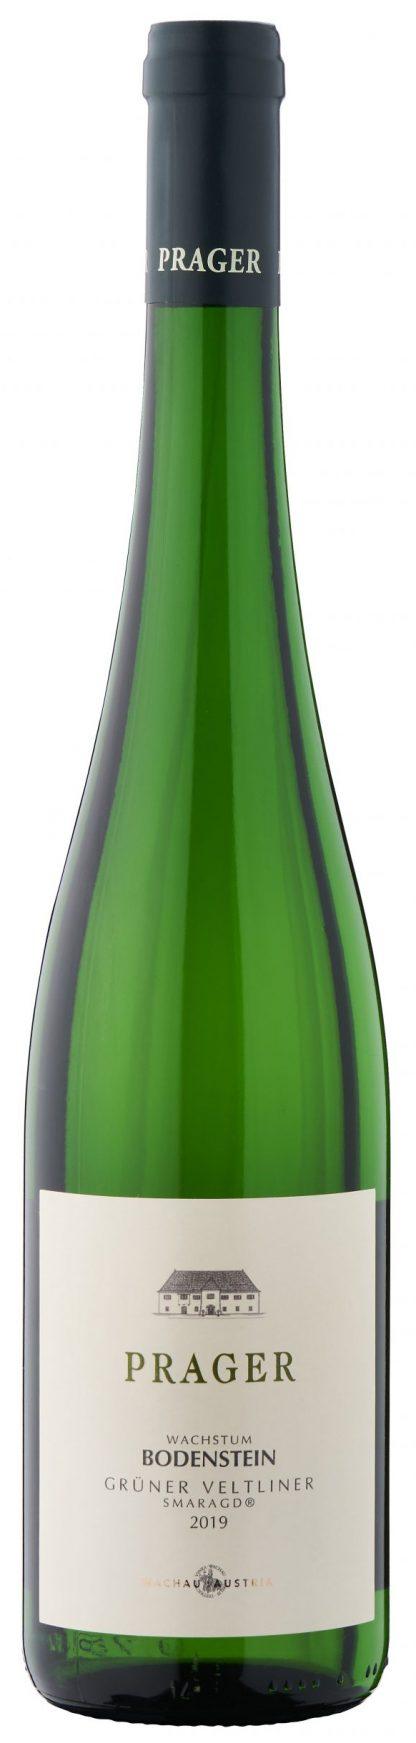 Prager - Grüner Veltliner Smaragd Wachstum Bodenstein 2019